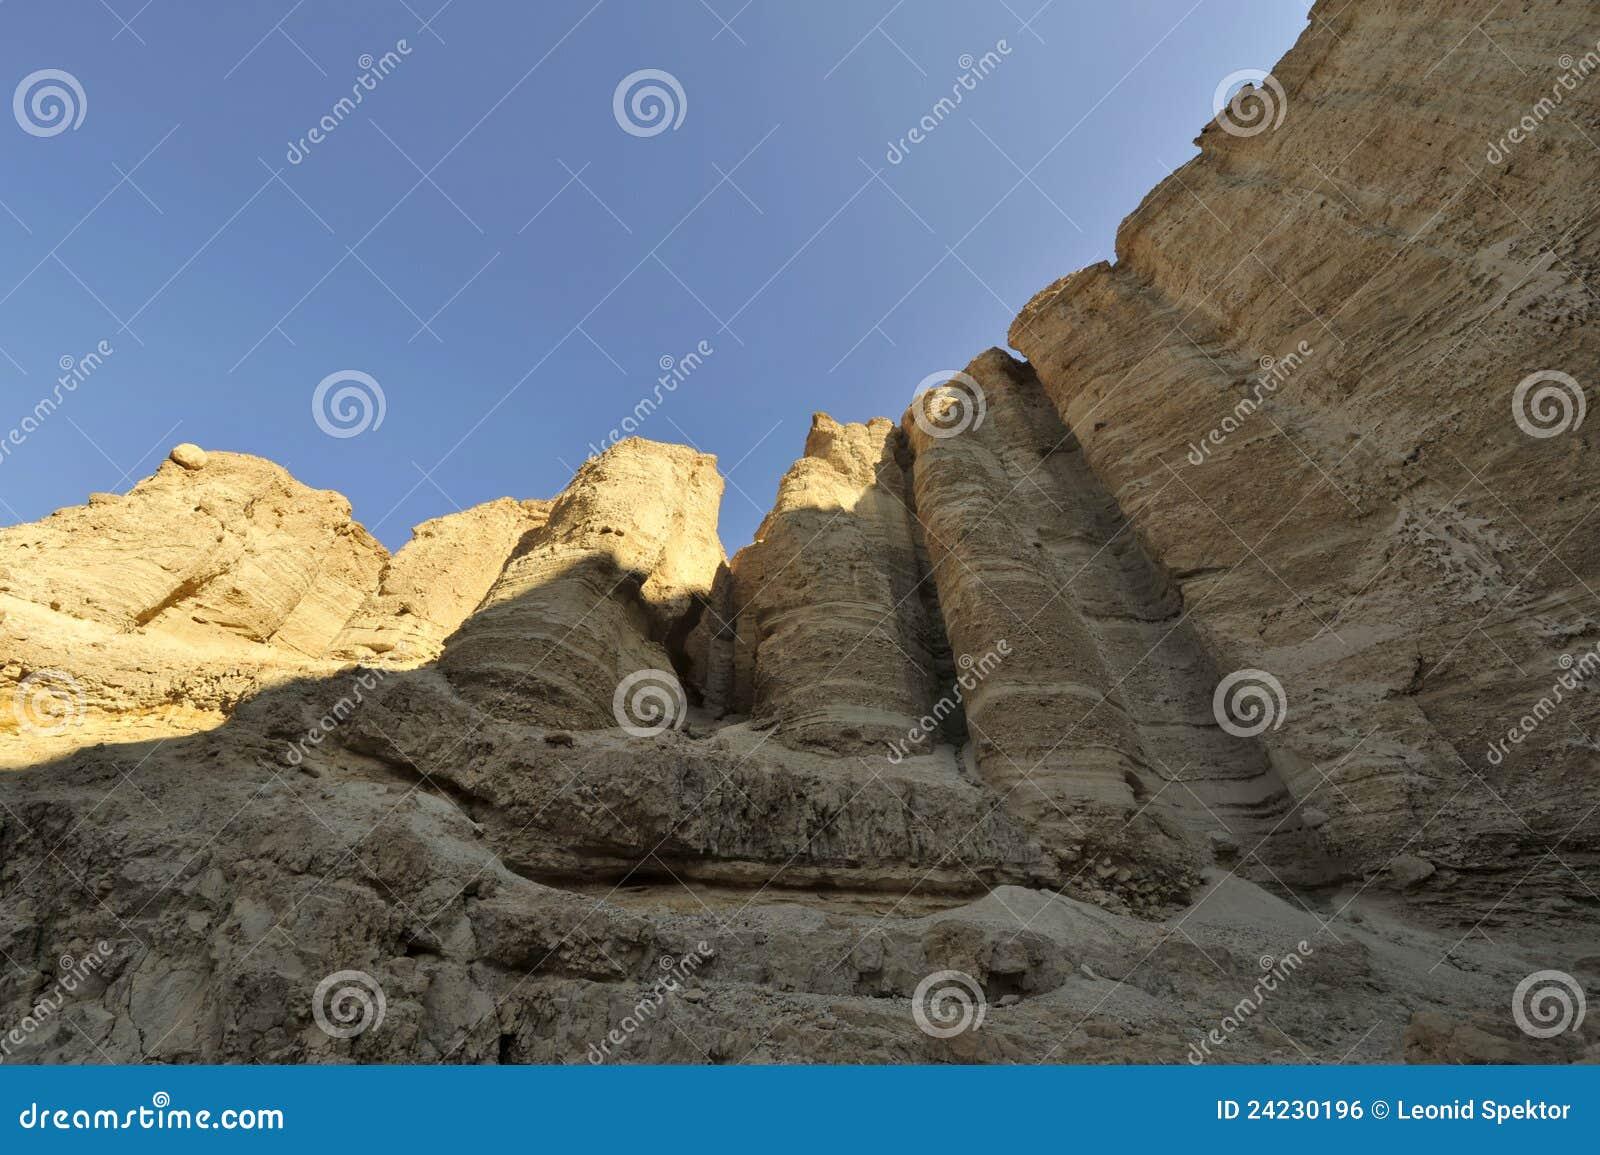 Stone pillars in Judea desert.